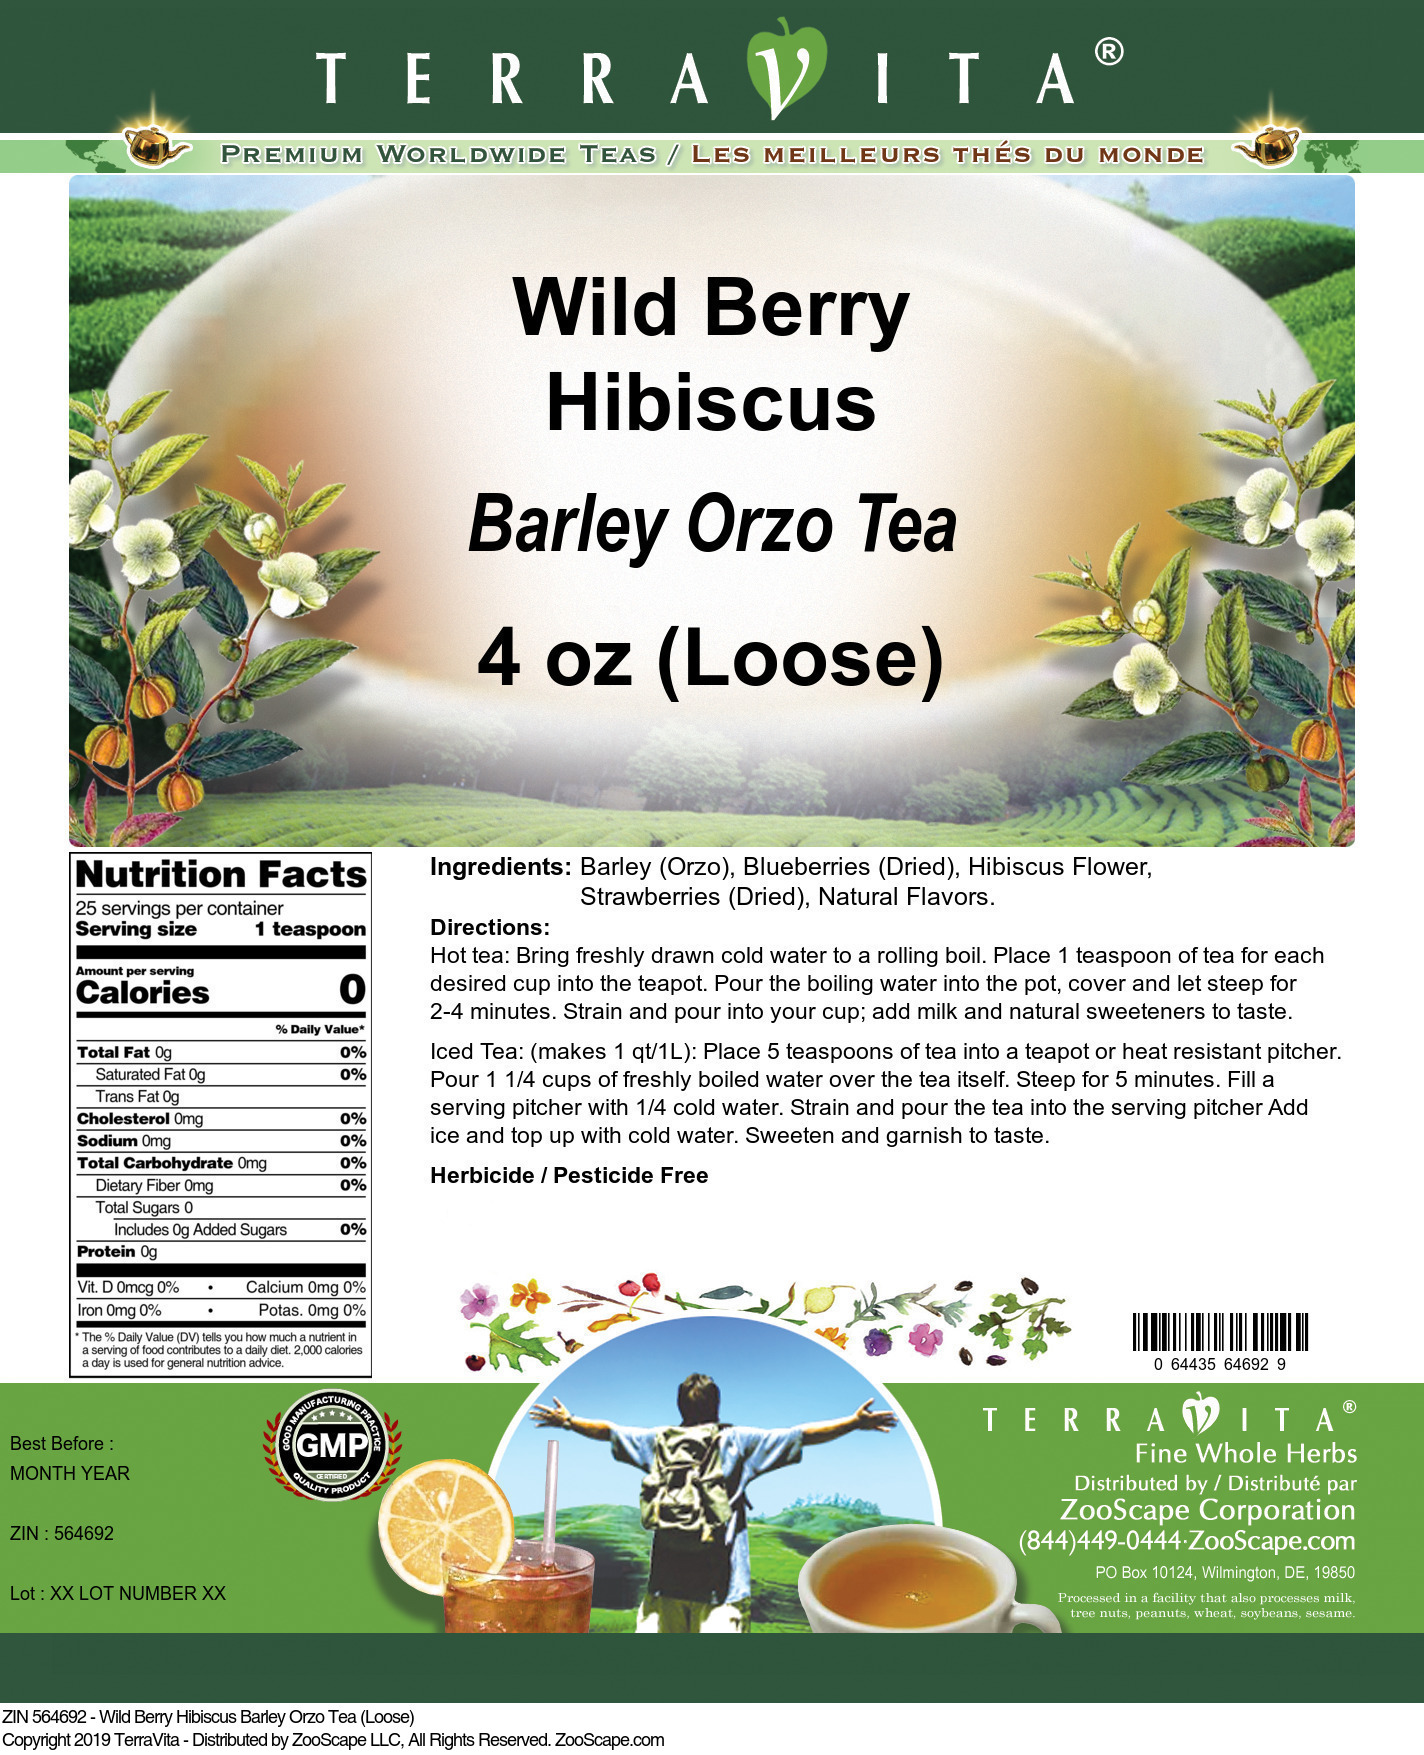 Wild Berry Hibiscus Barley Orzo